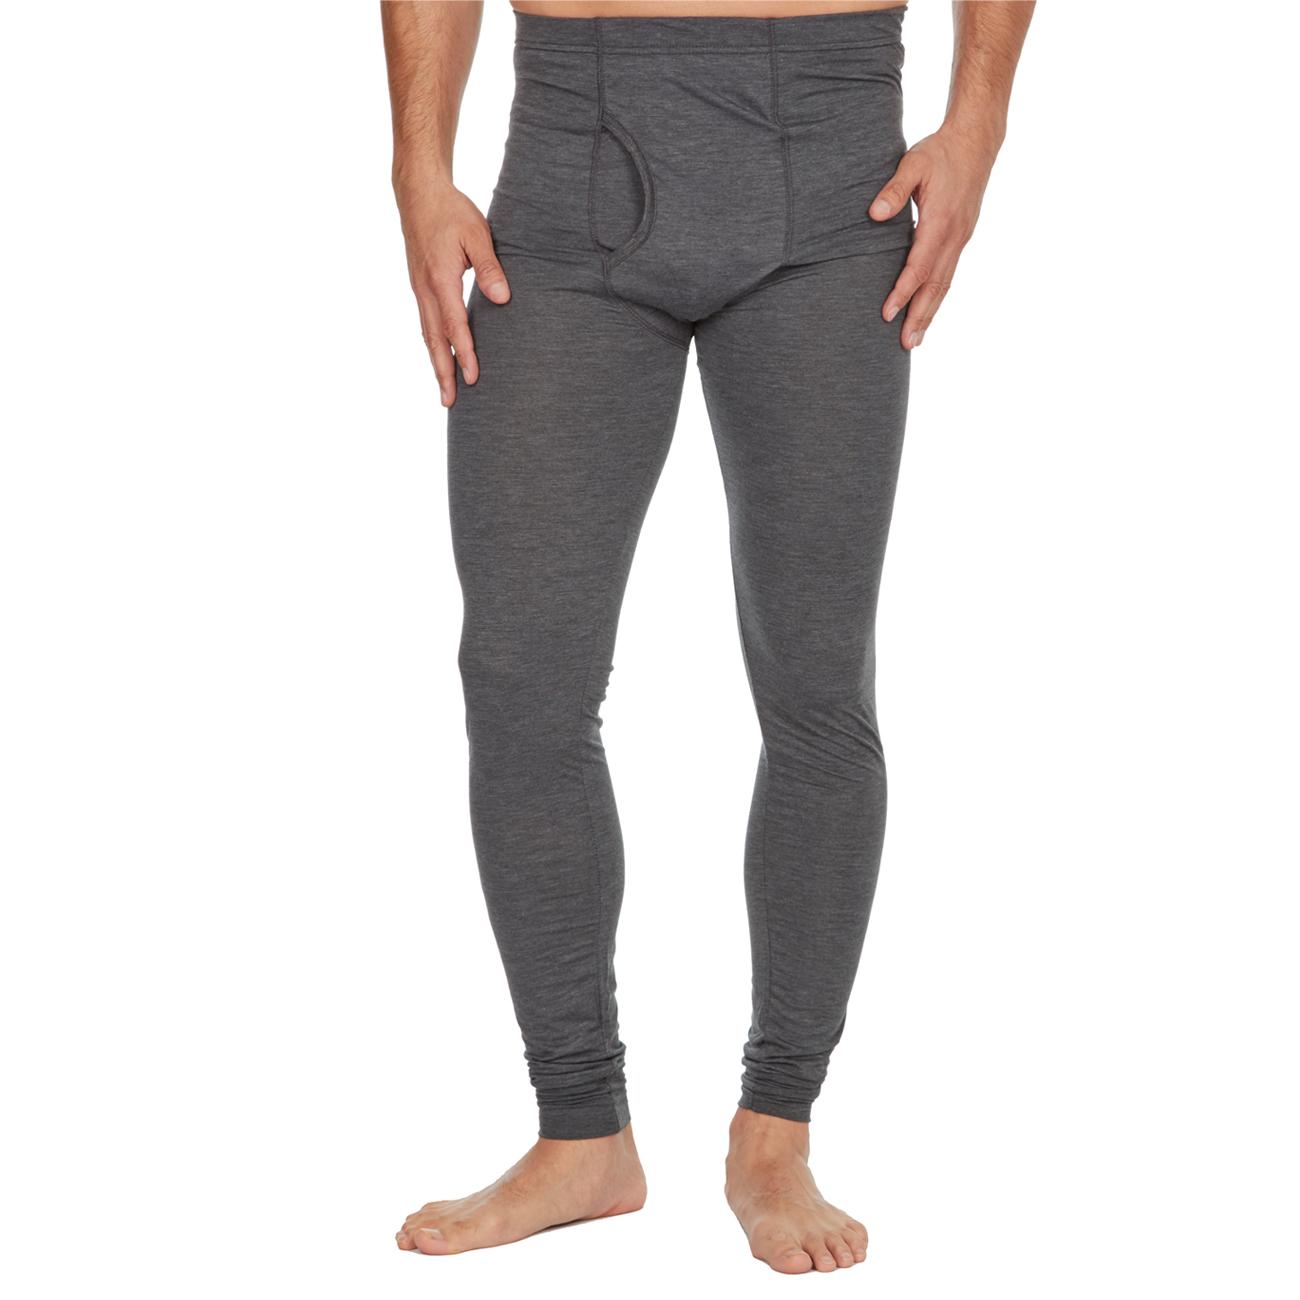 MENS BLACK THERMAL 3//4 CROP BOTTOMS Underwear BASE LAYER SET Spiderman Thermals